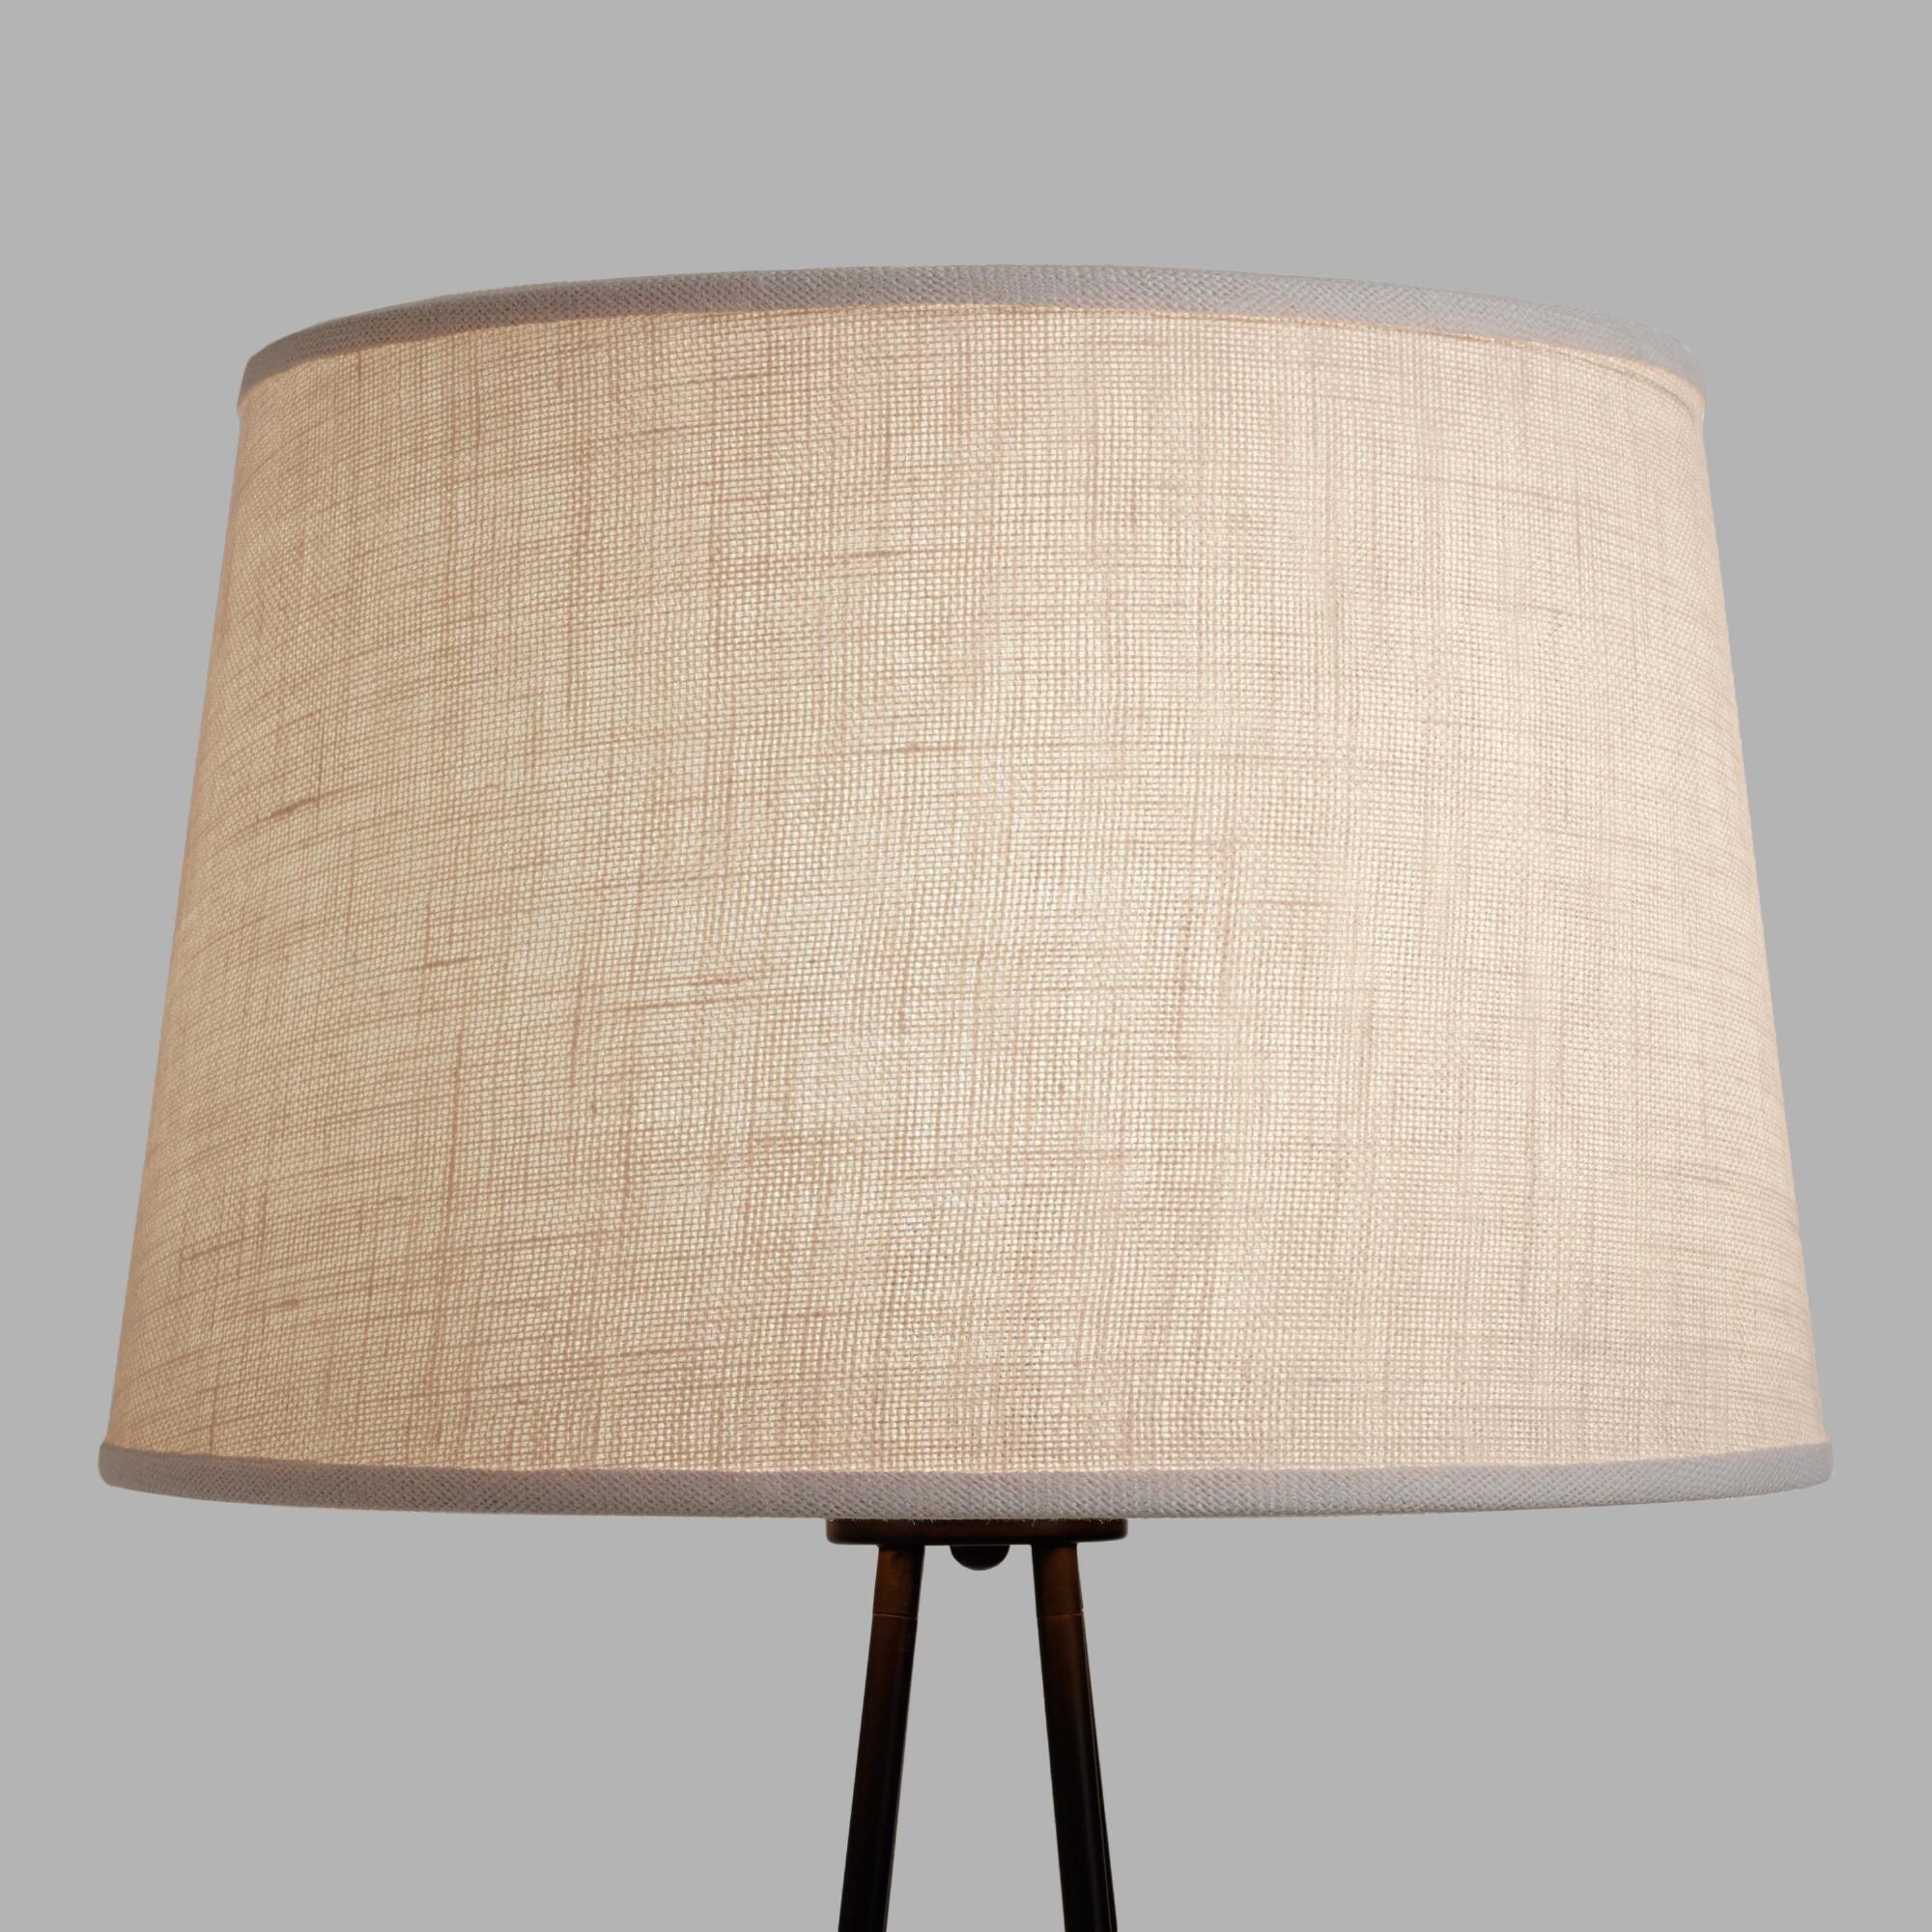 Marshmallow white burlap floor lamp shade natural fiber by world market